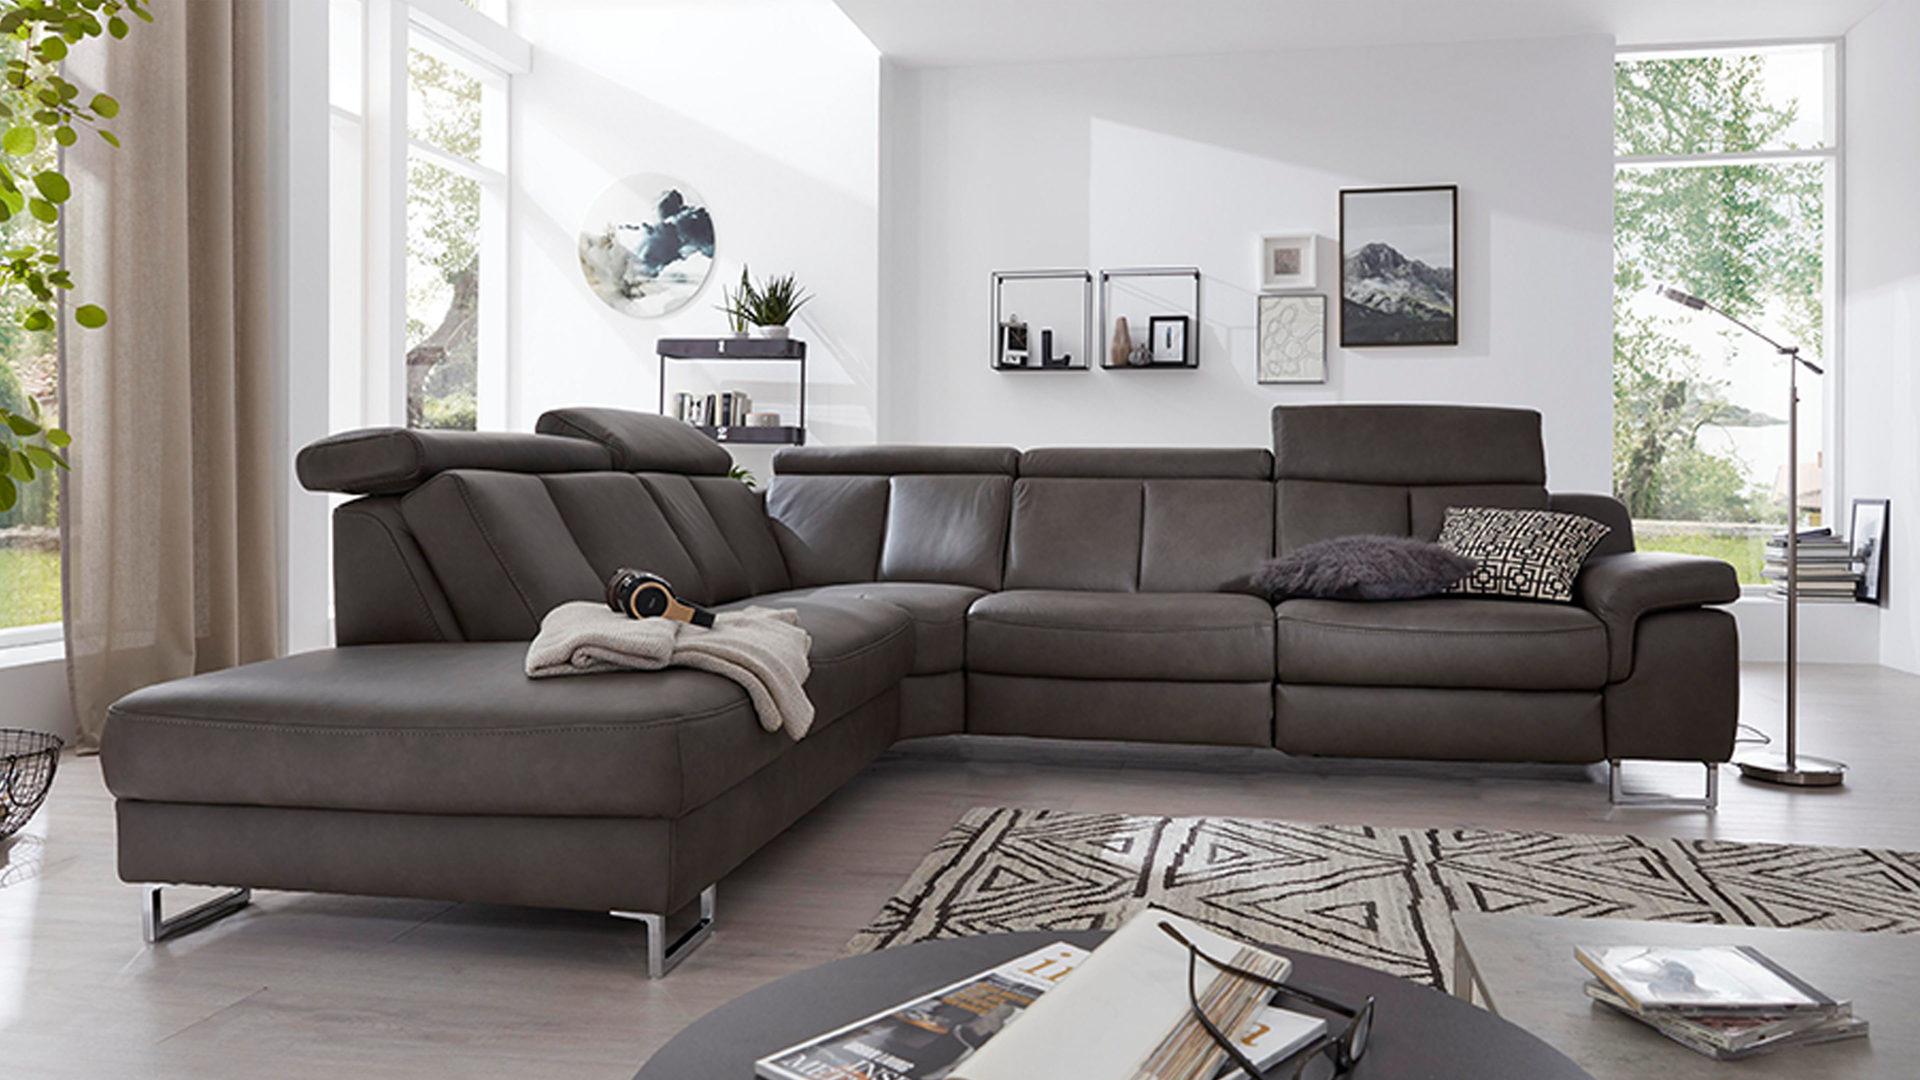 Interliving Sofa Serie 12 – Eckkombination, graues LongLife Leder Cloudy  Grey & Chromfüße – Schenkelmaß ca. 12 x 12 c